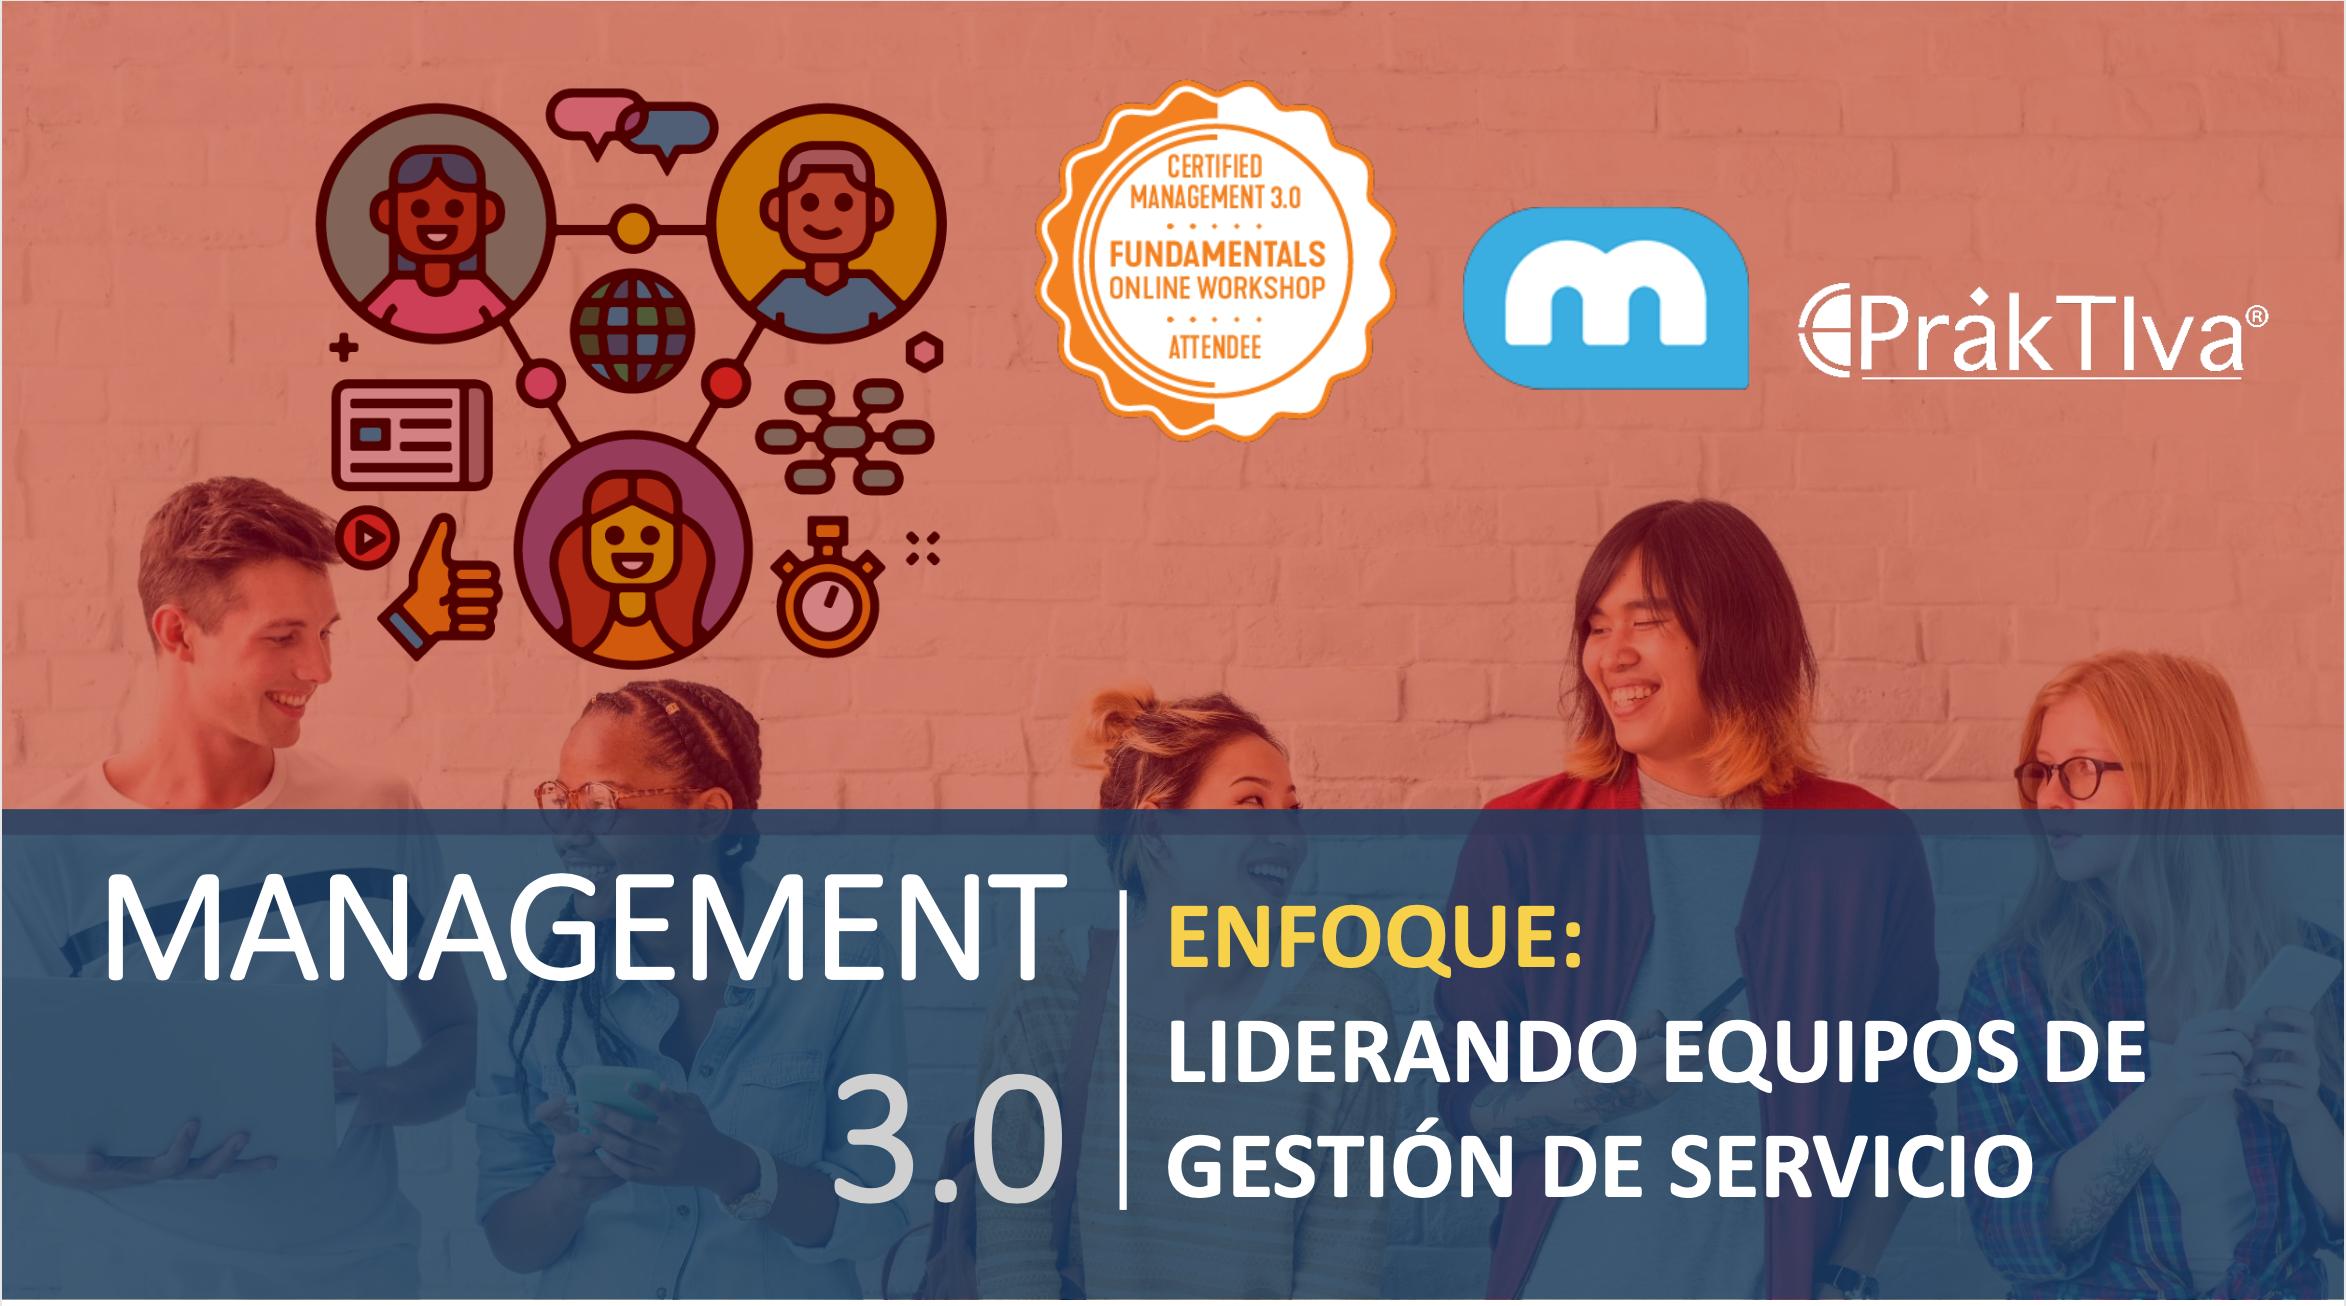 mejores certificaciones de management 3.0